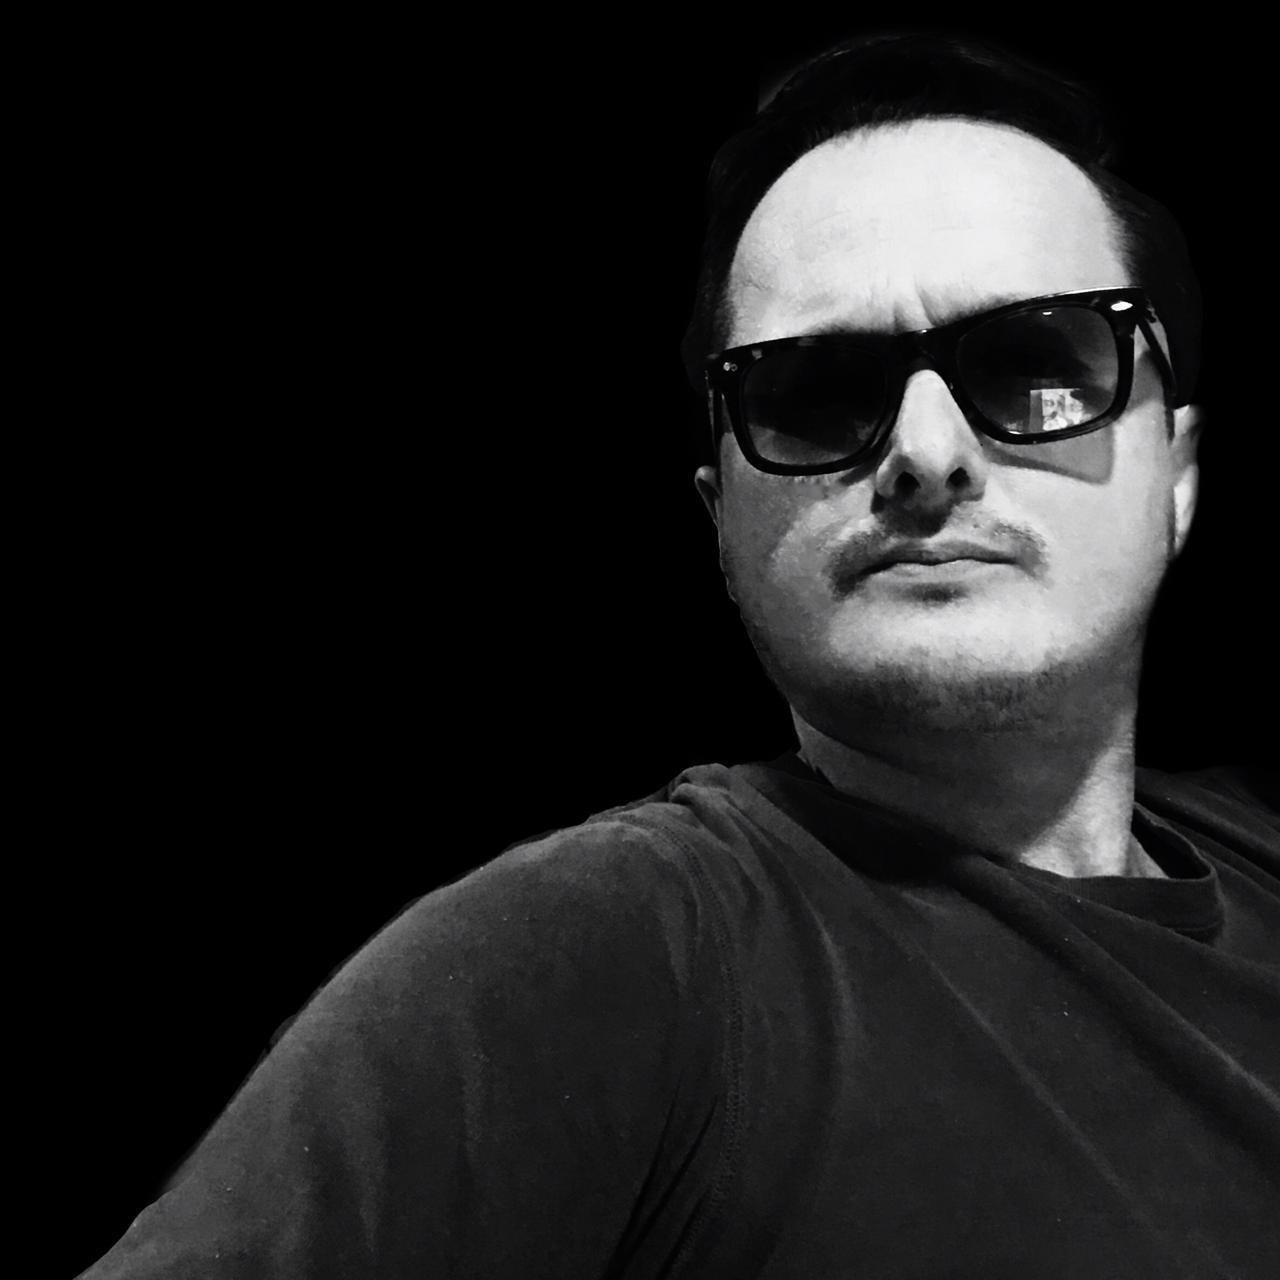 Guest DJ Bustamante